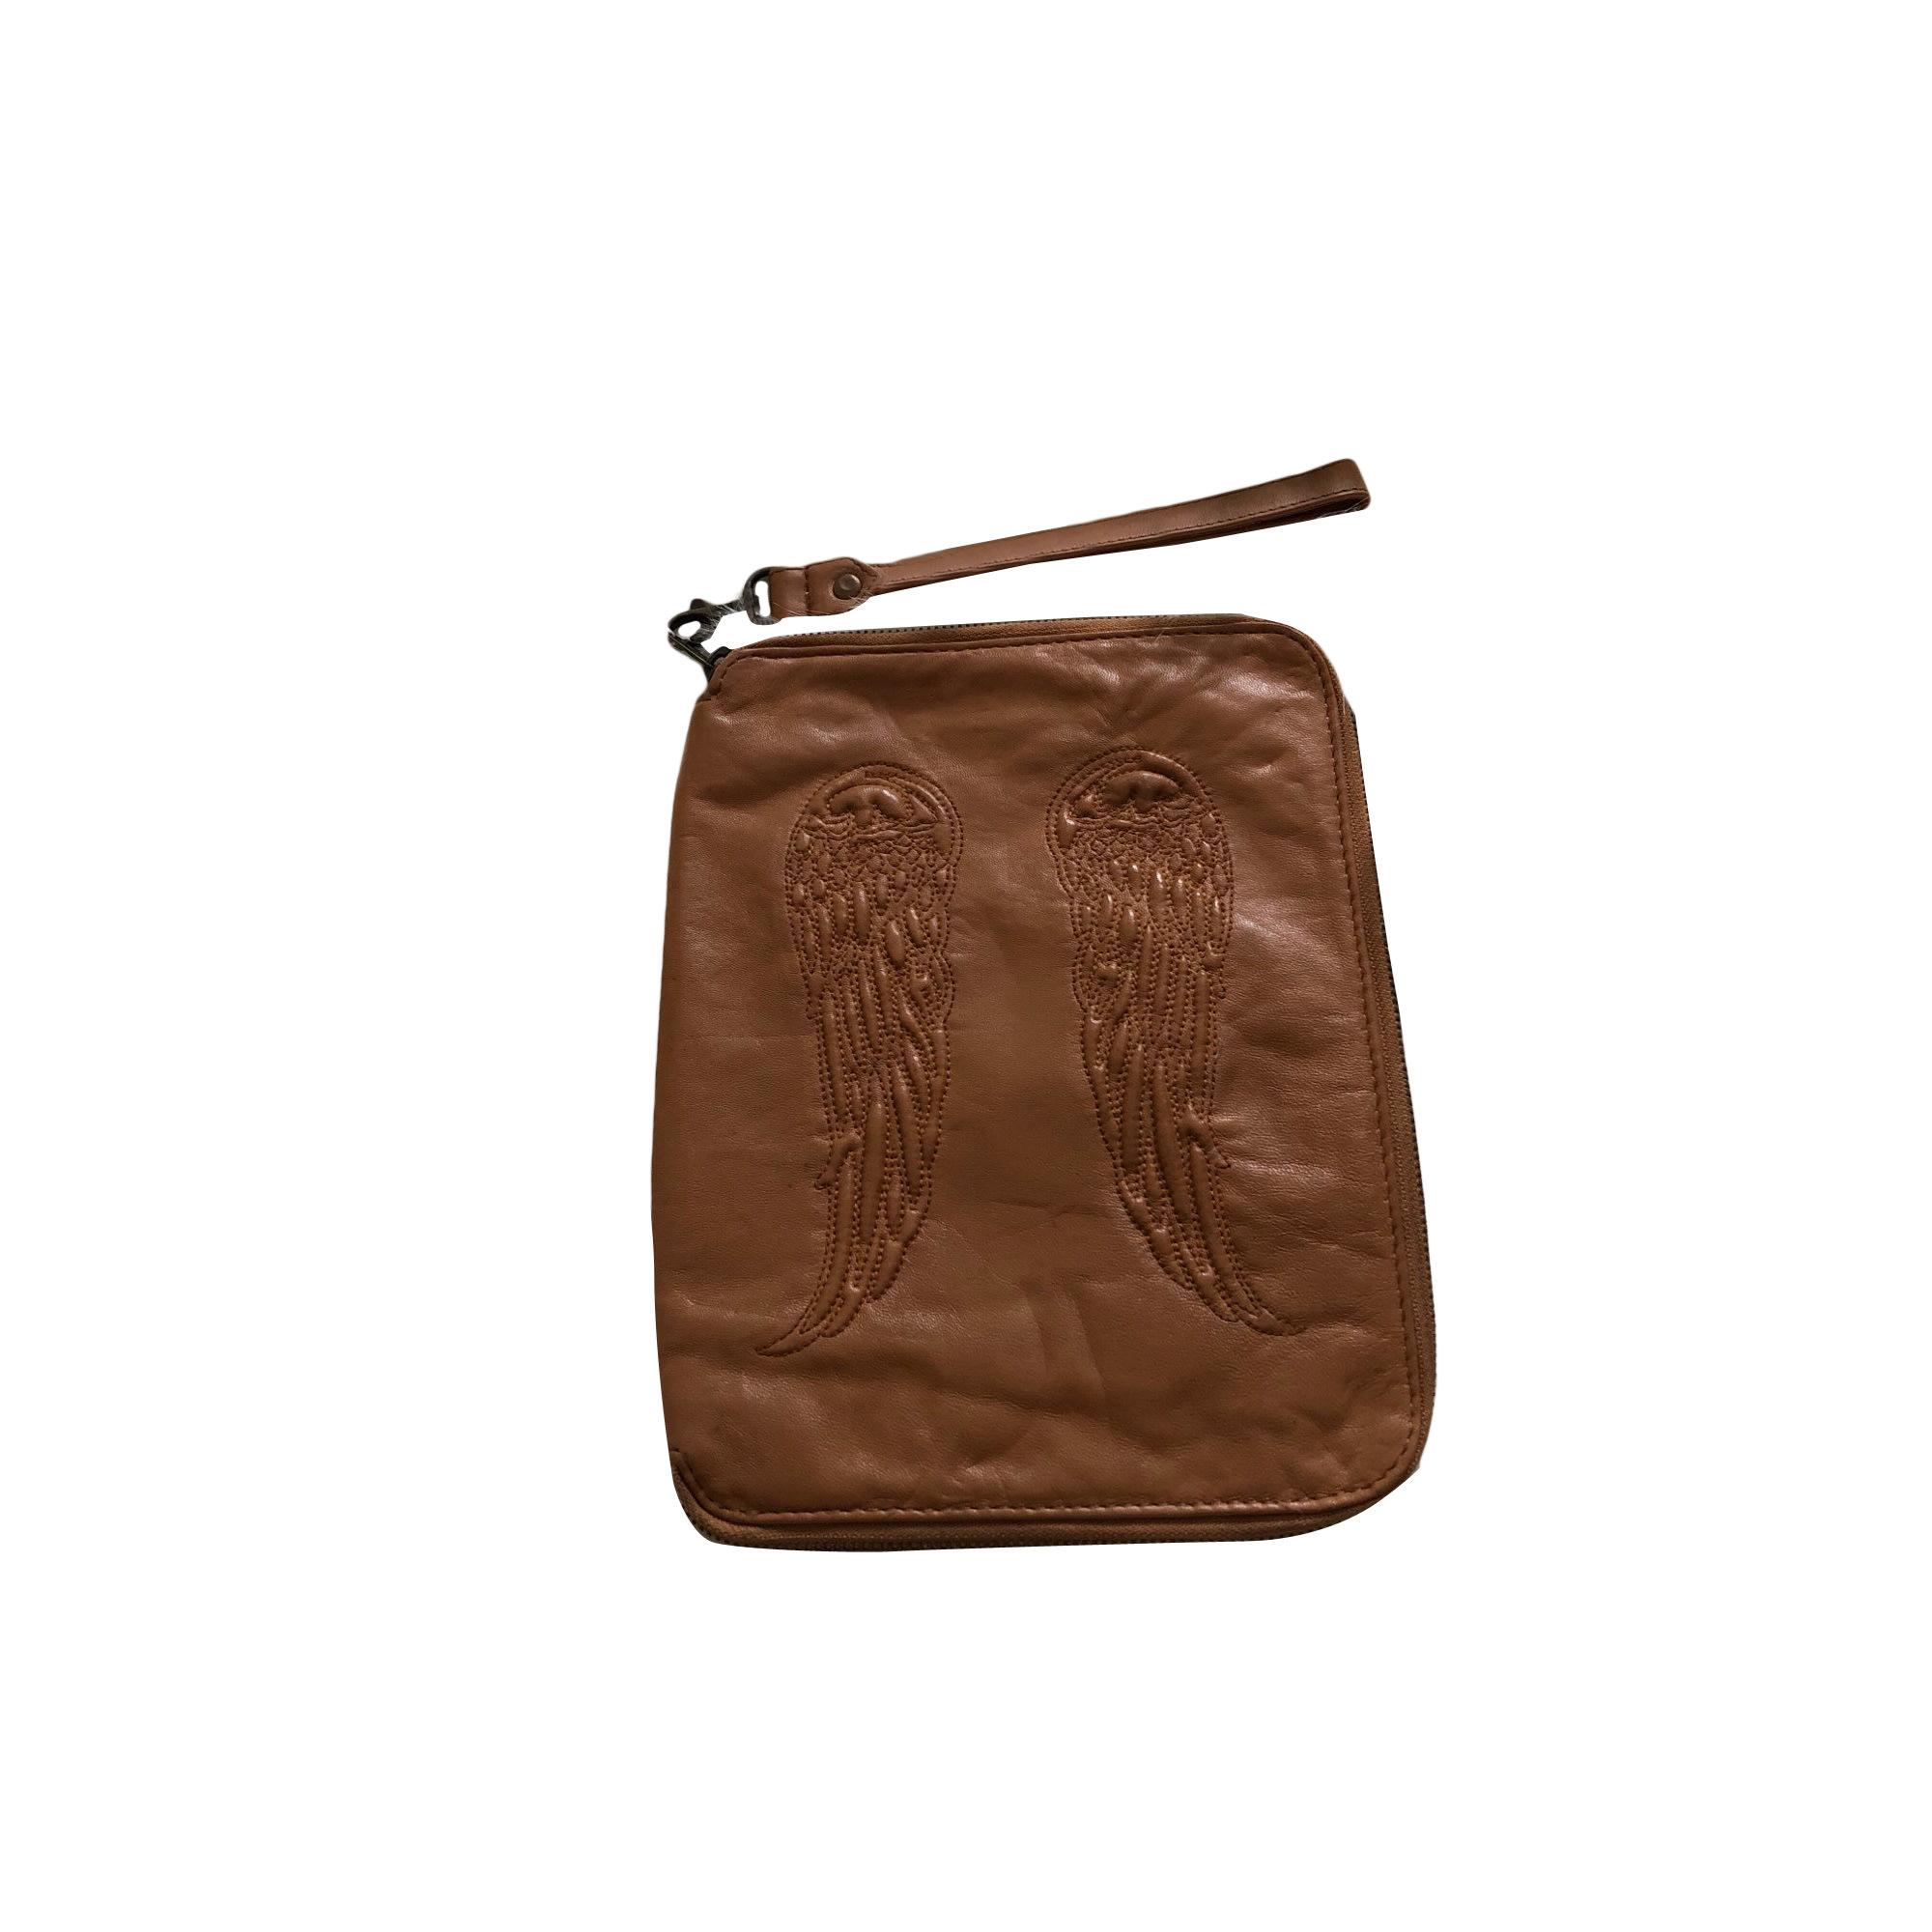 Porte documents, serviette BERENICE cuir beige